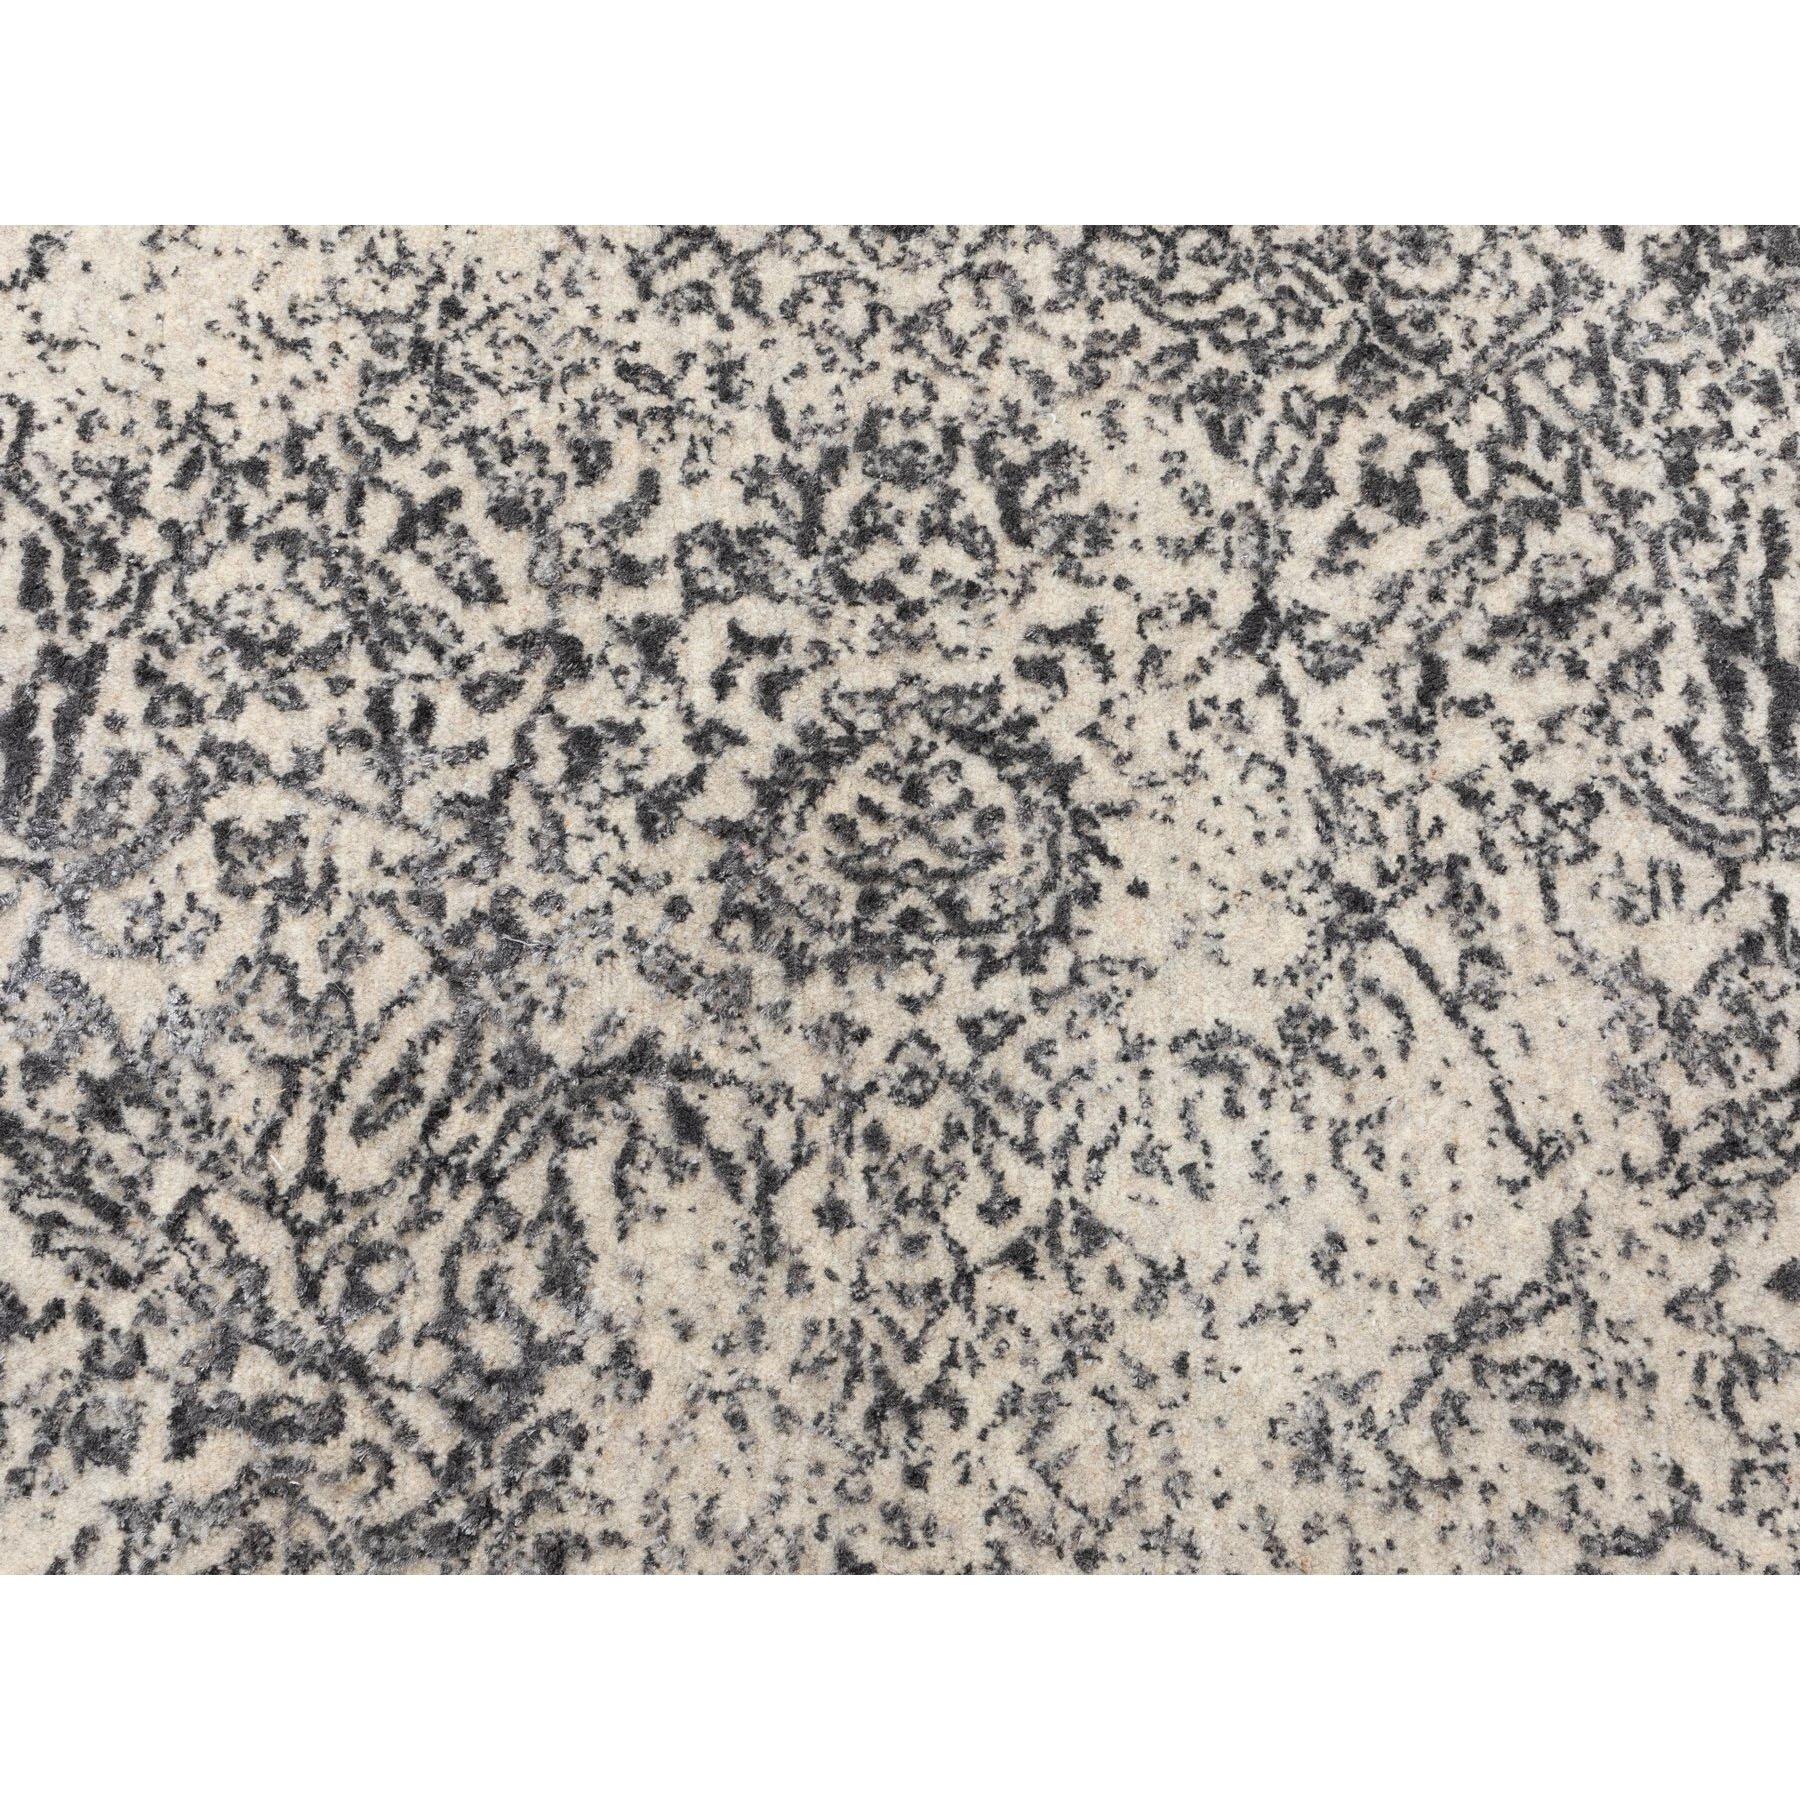 "5'10""x5'10"" Round Fine jacquard Hand Loomed Erased Design Wool And Silk Oriental Rug"